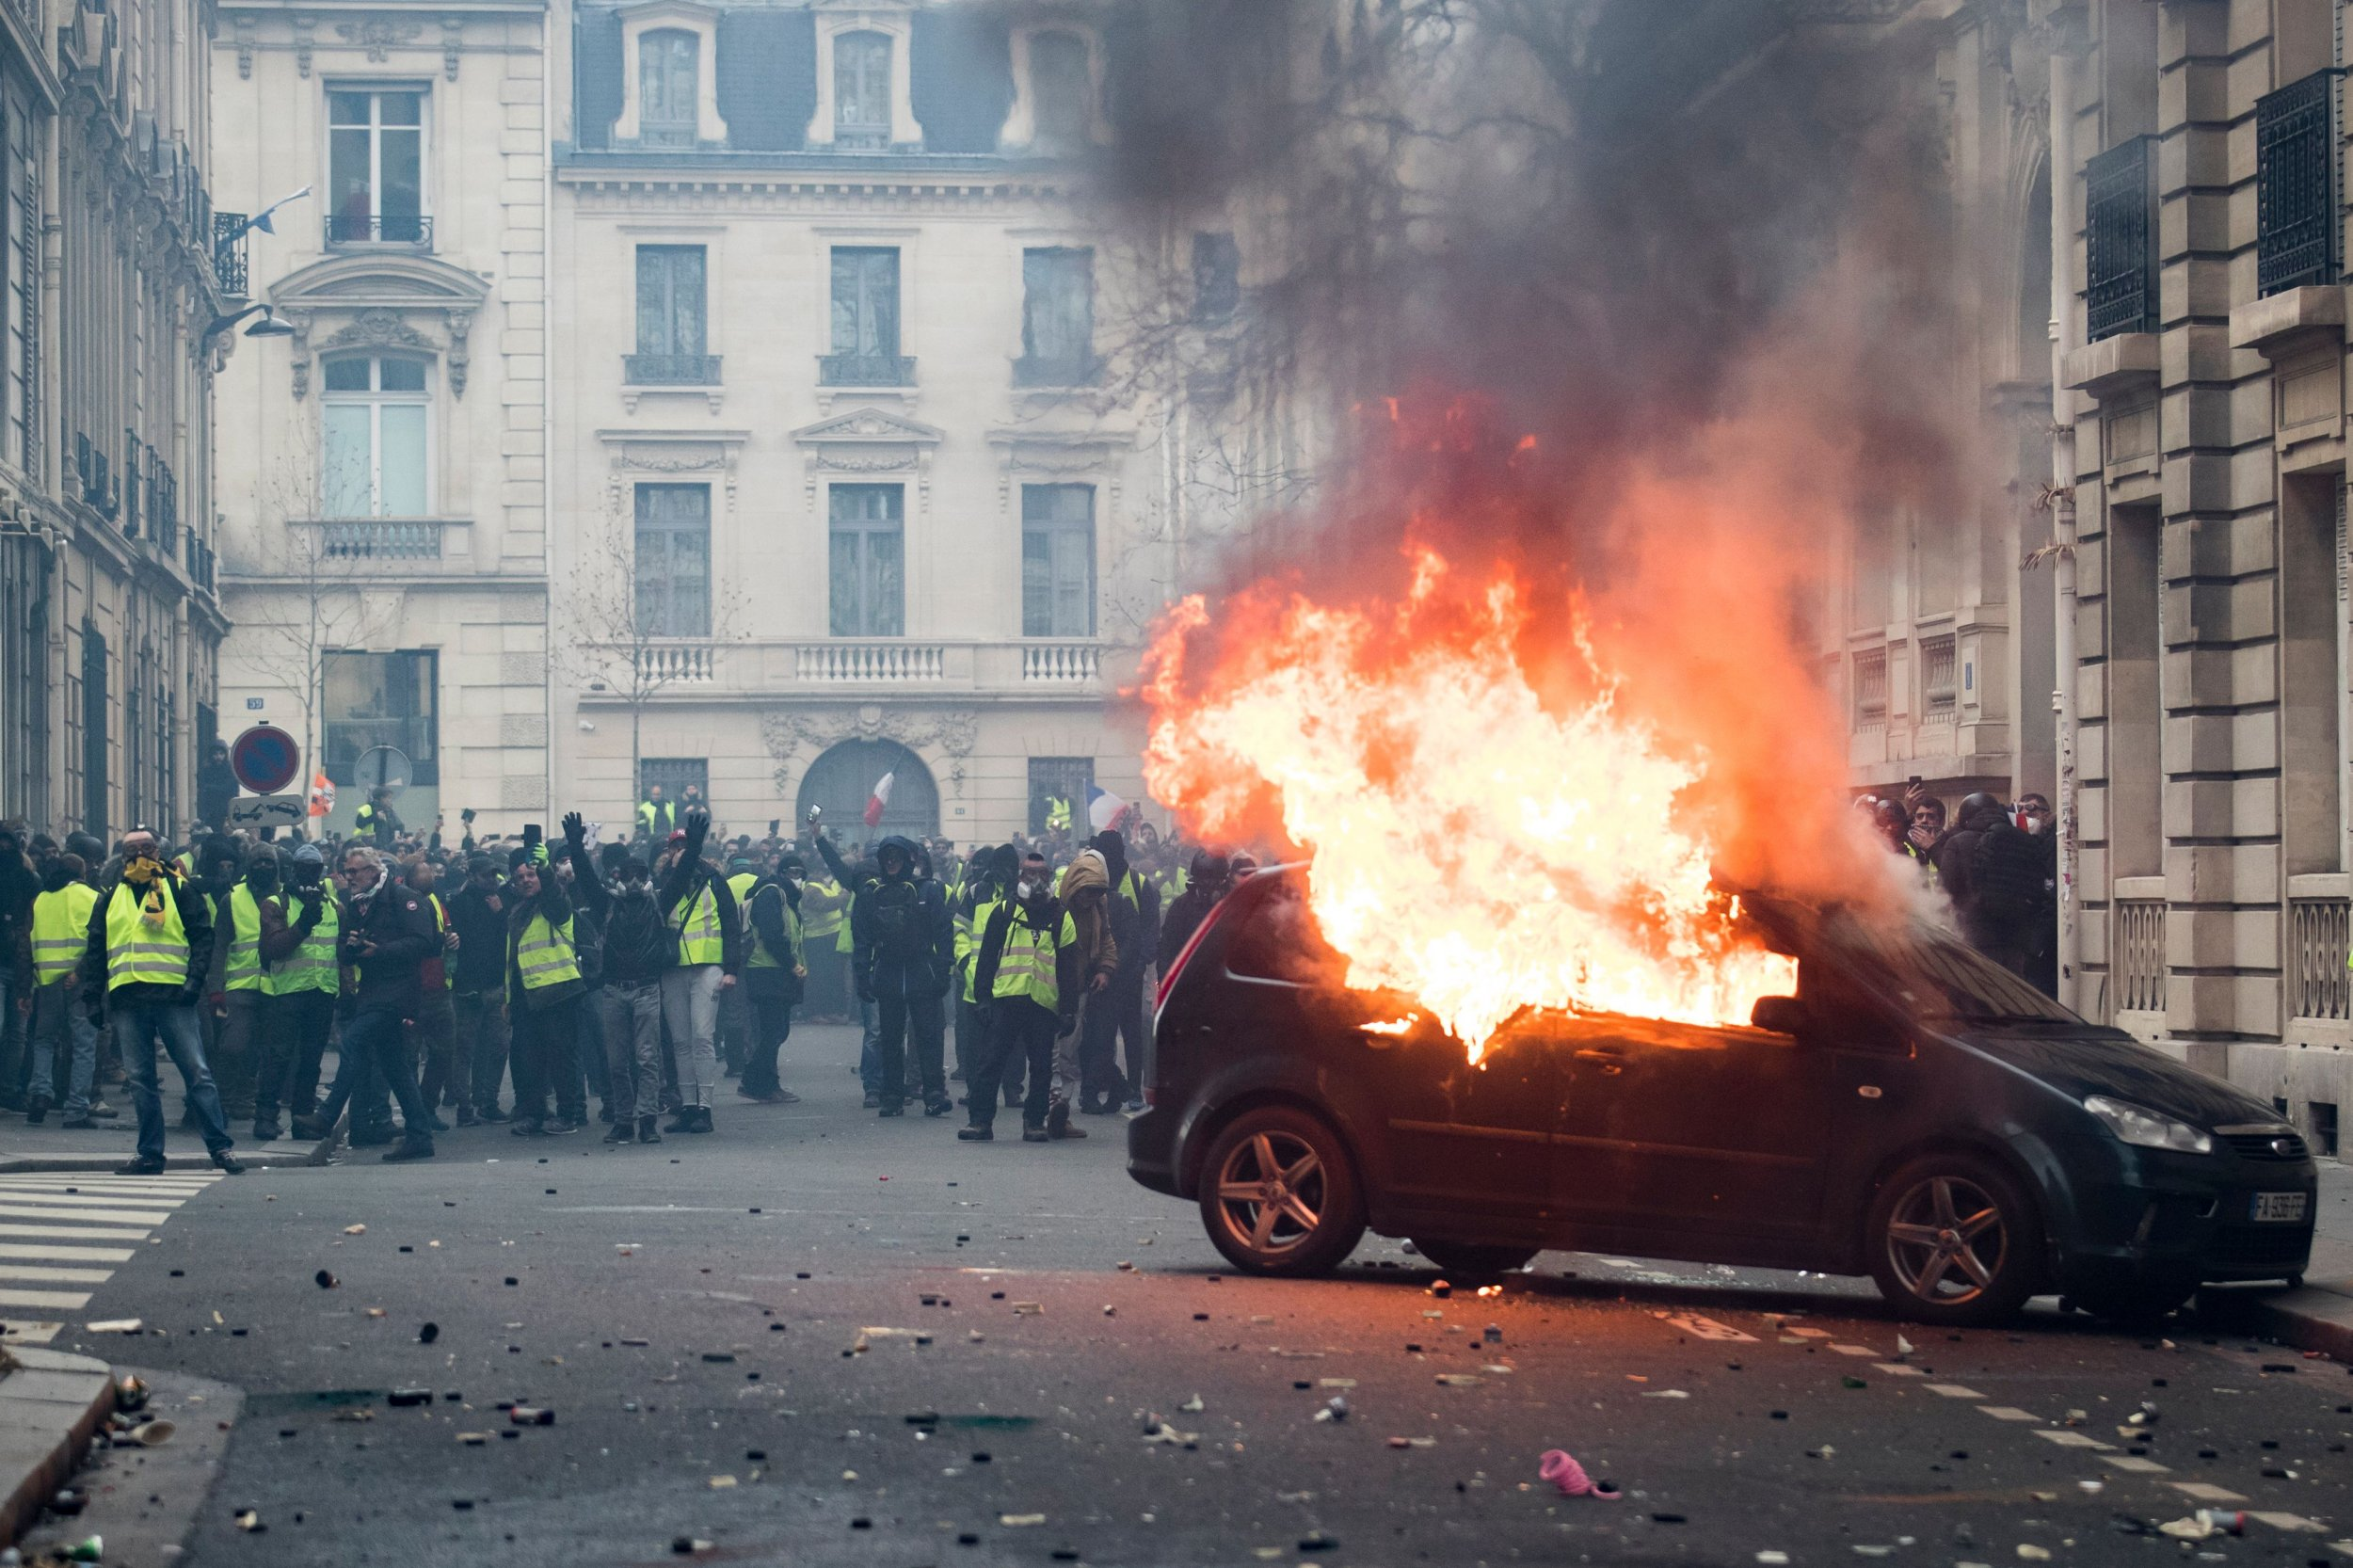 donald trump, fox news, paris, france, climate, burning